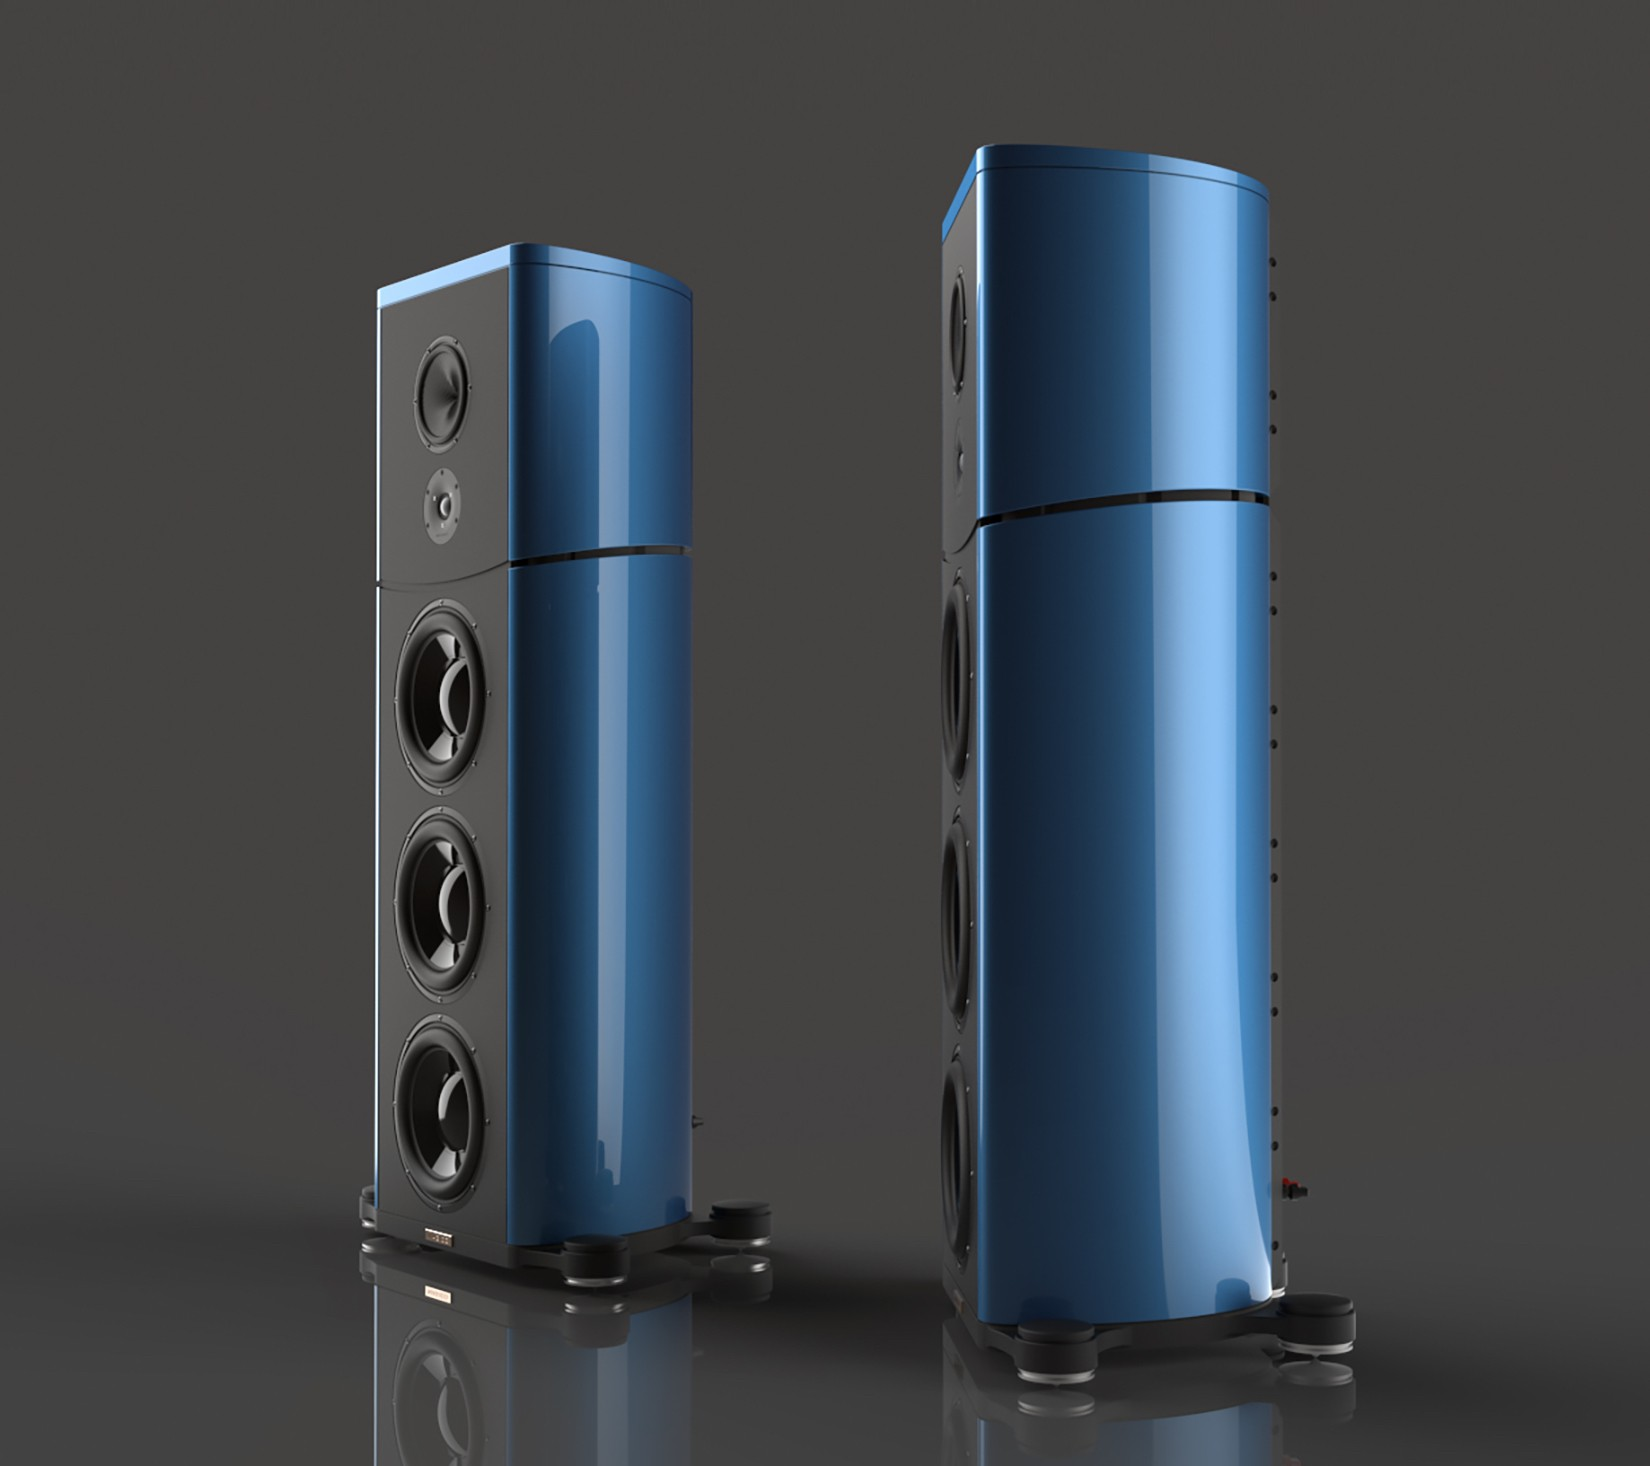 Magico S7 Speakers